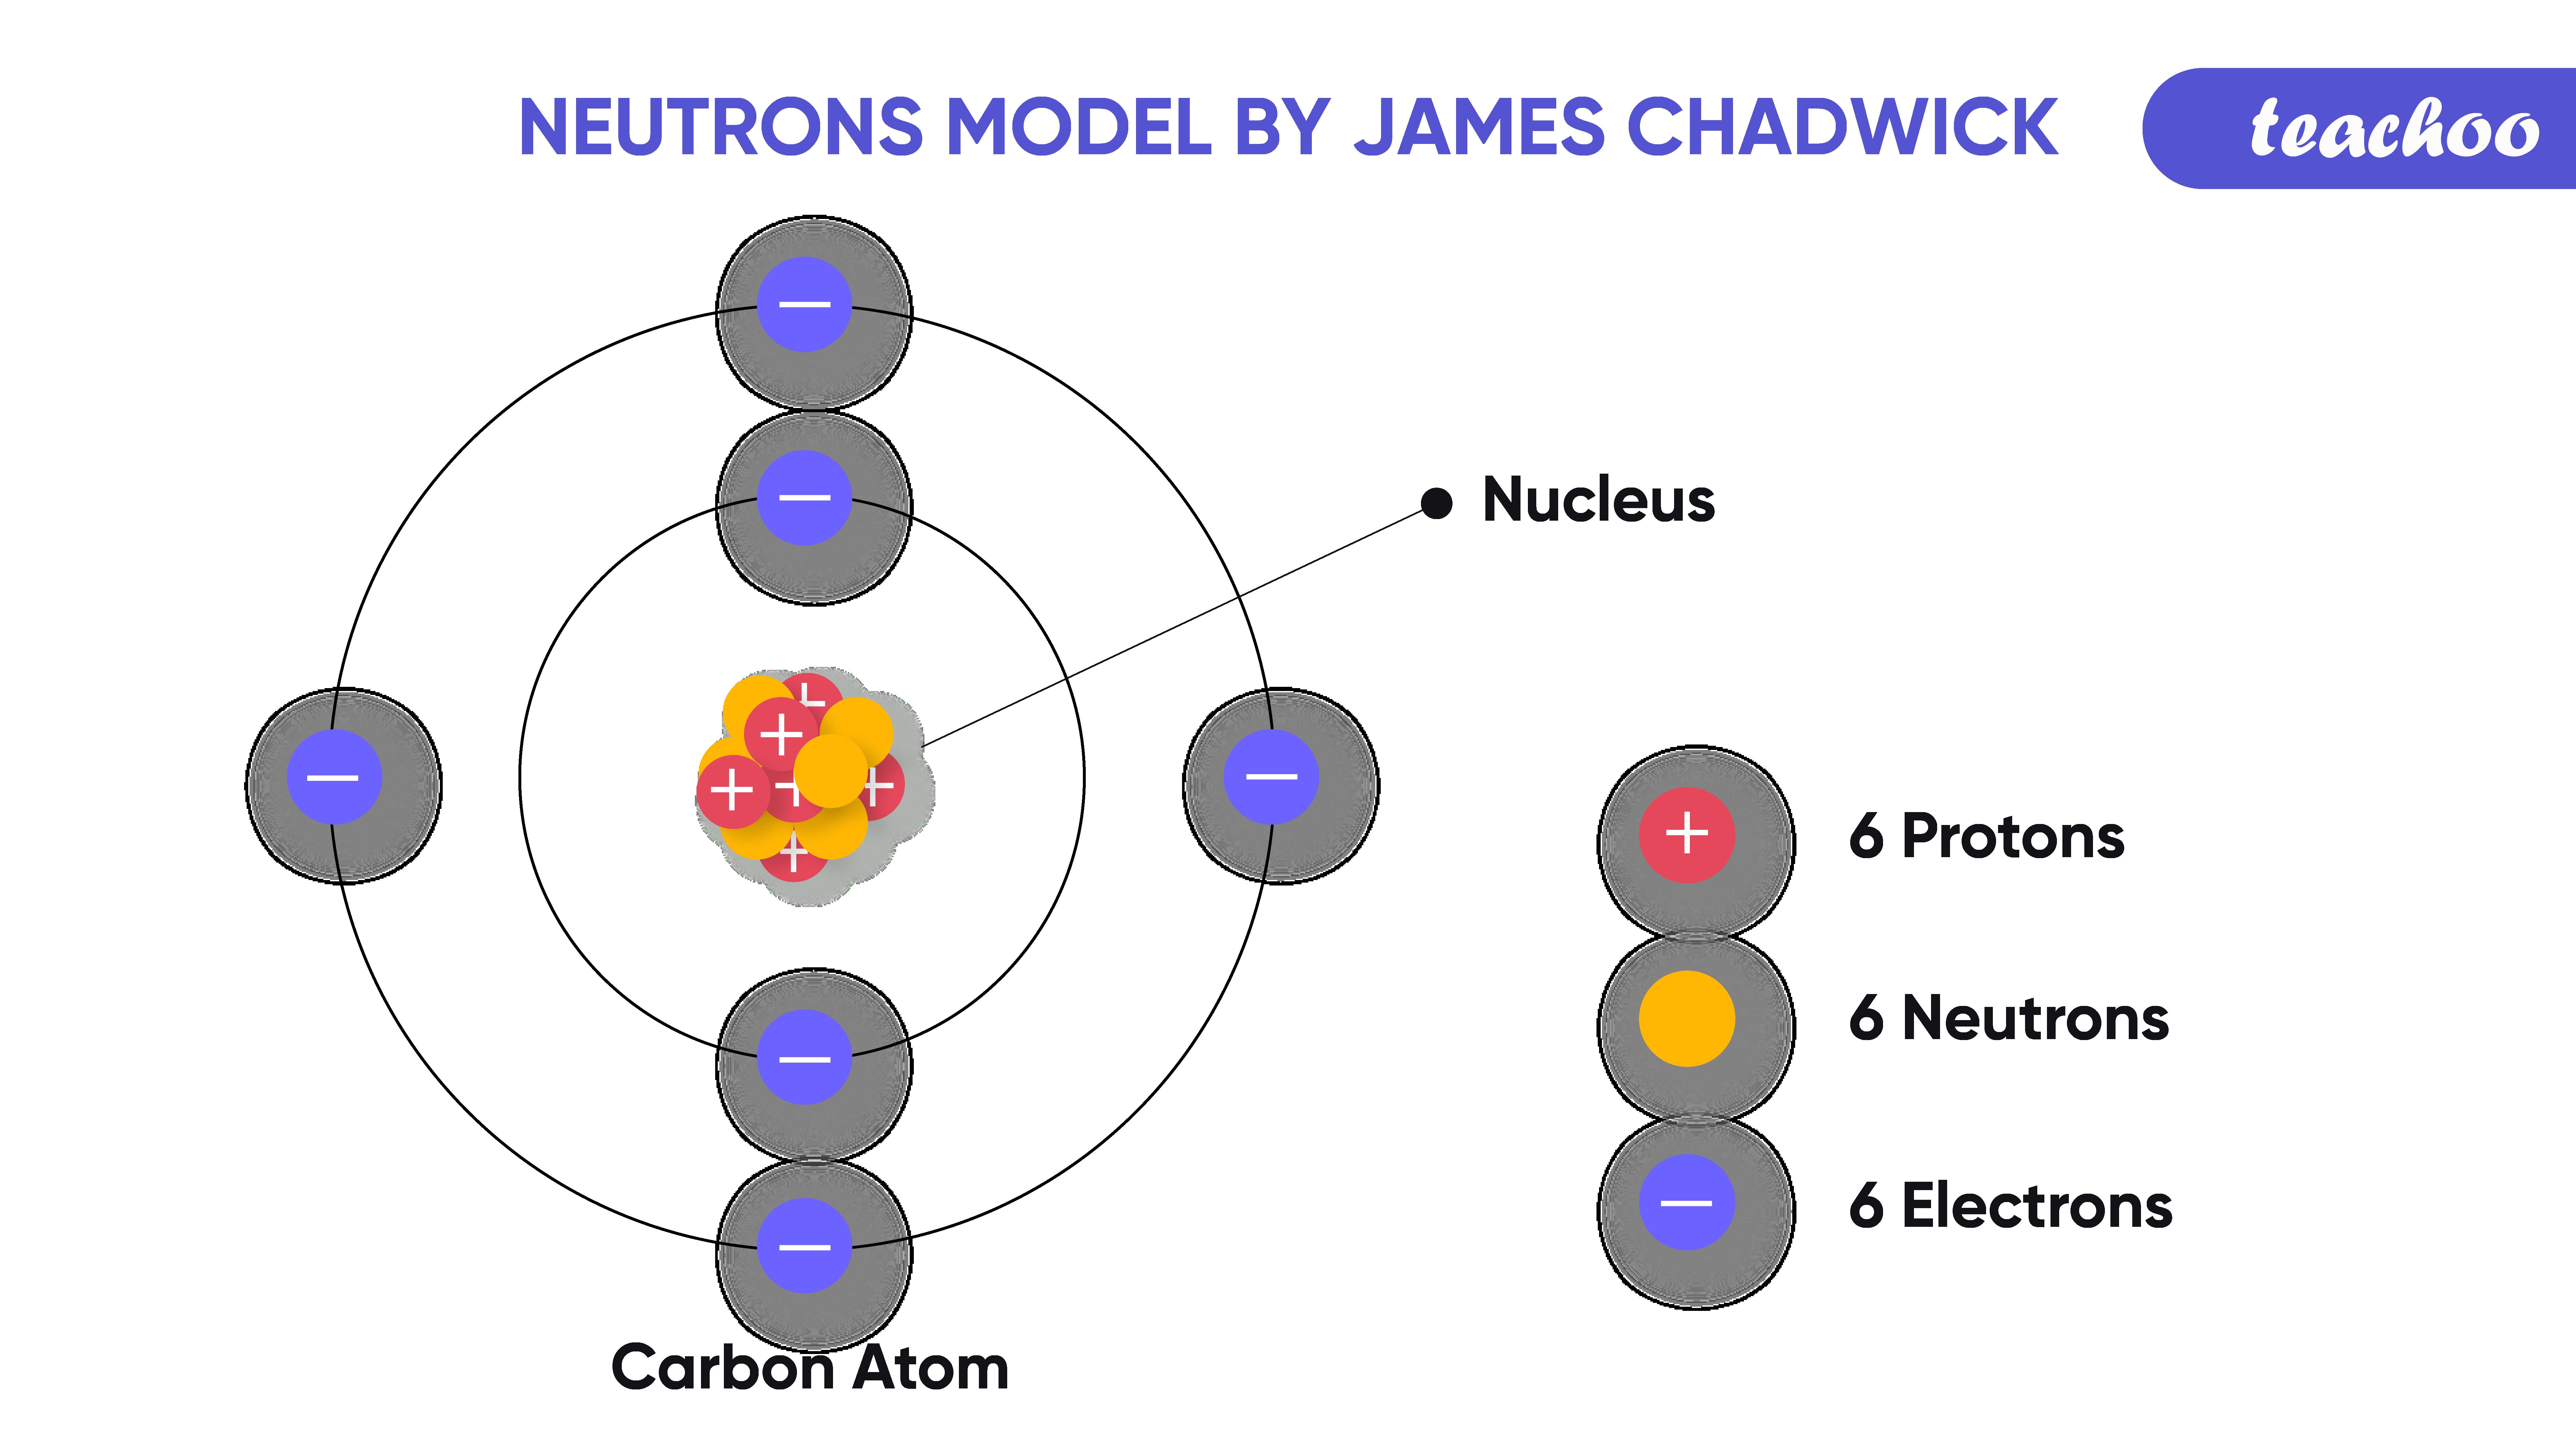 12. neutrons model of james chadwick-Teachoo-01.png